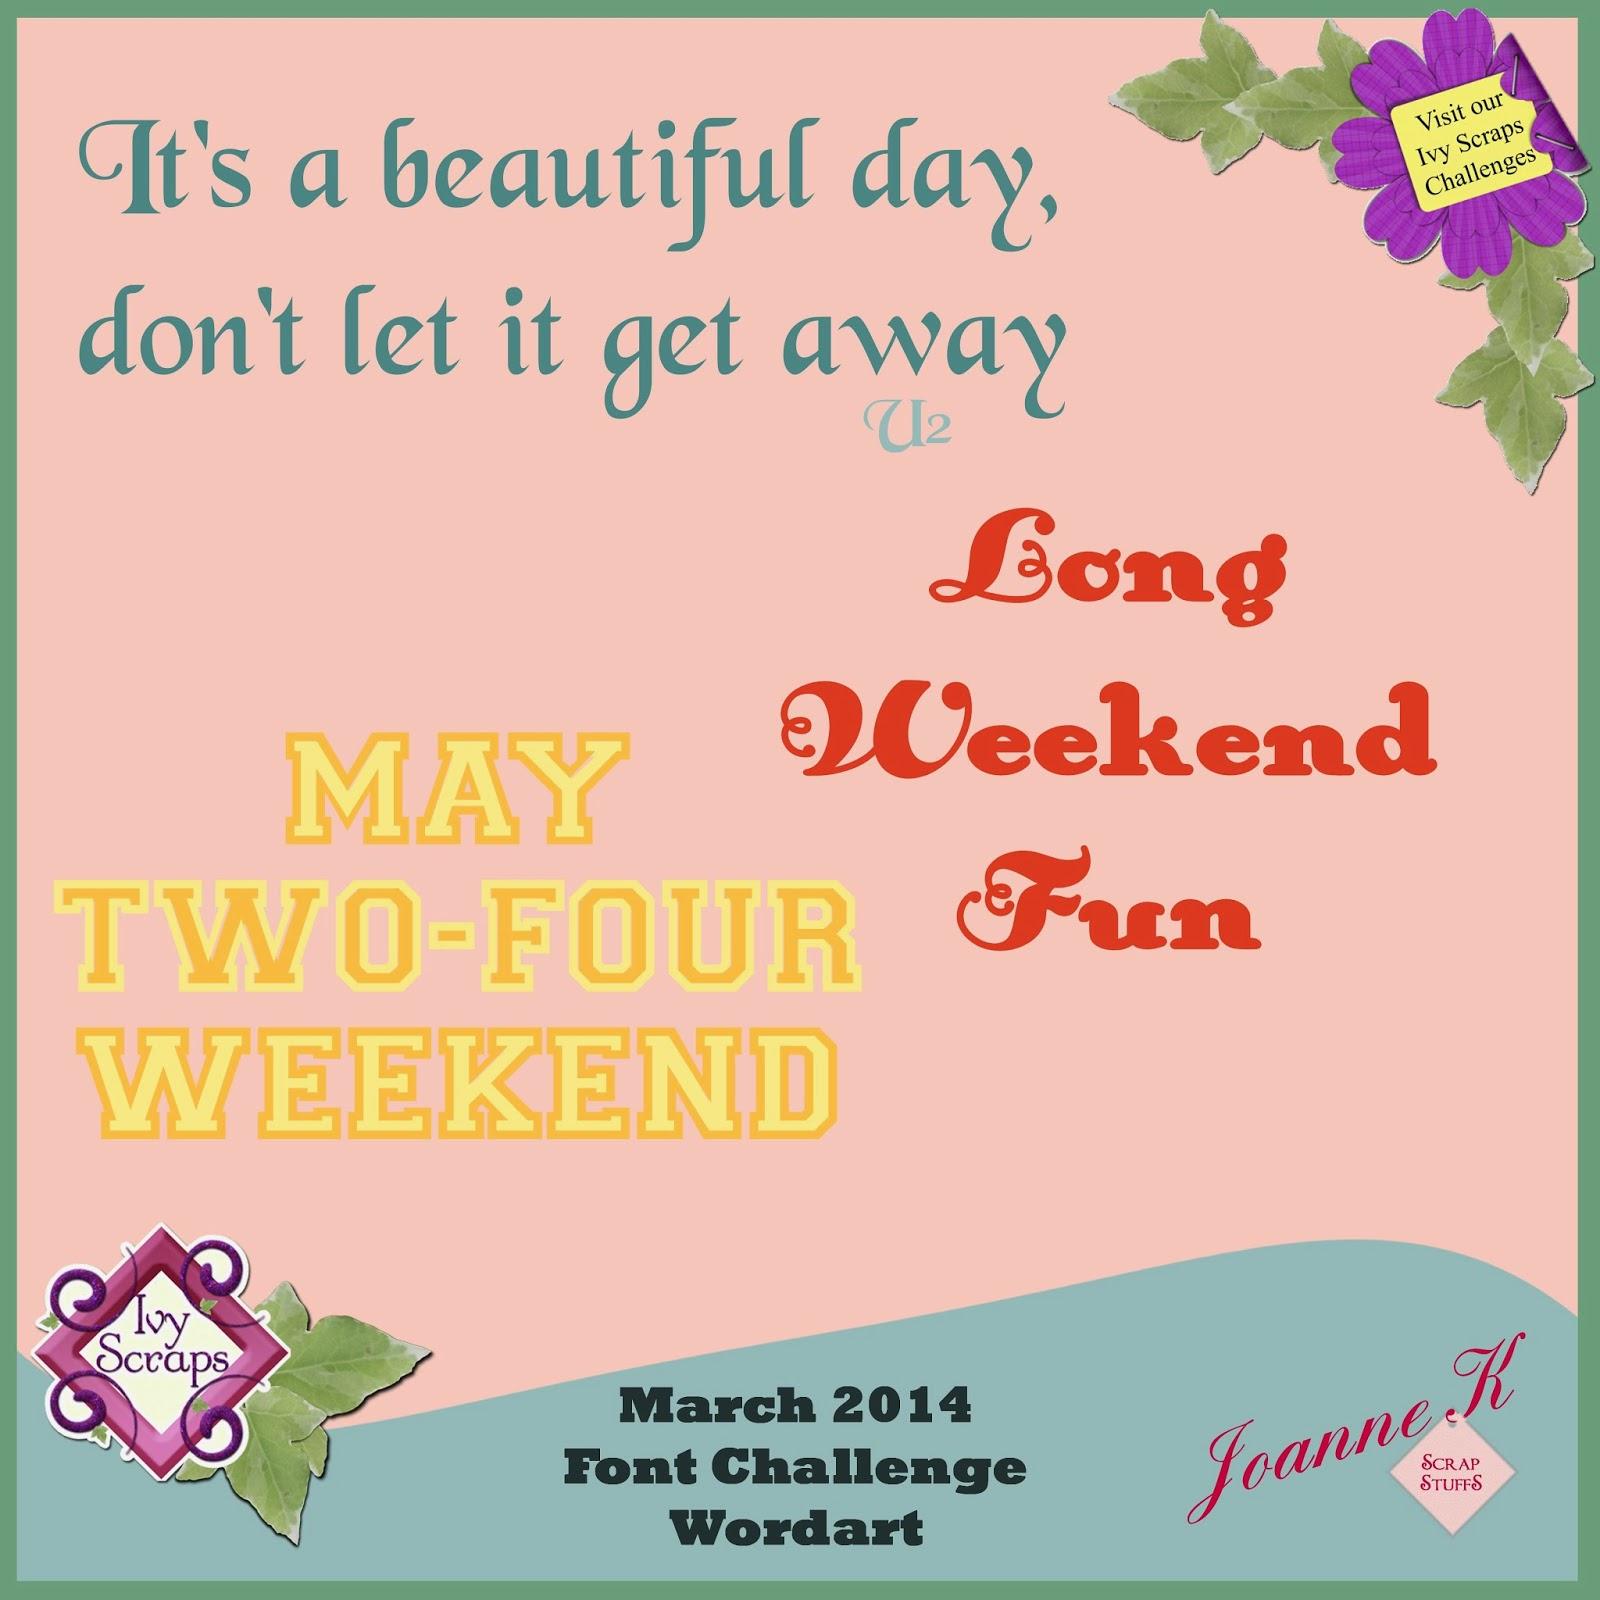 http://3.bp.blogspot.com/-oOYZ1MXXp94/U2Qw0909GBI/AAAAAAAAAEI/Zh4sd8P6FM0/s1600/JLK_May14FontChallenge__%60Wordart.jpg